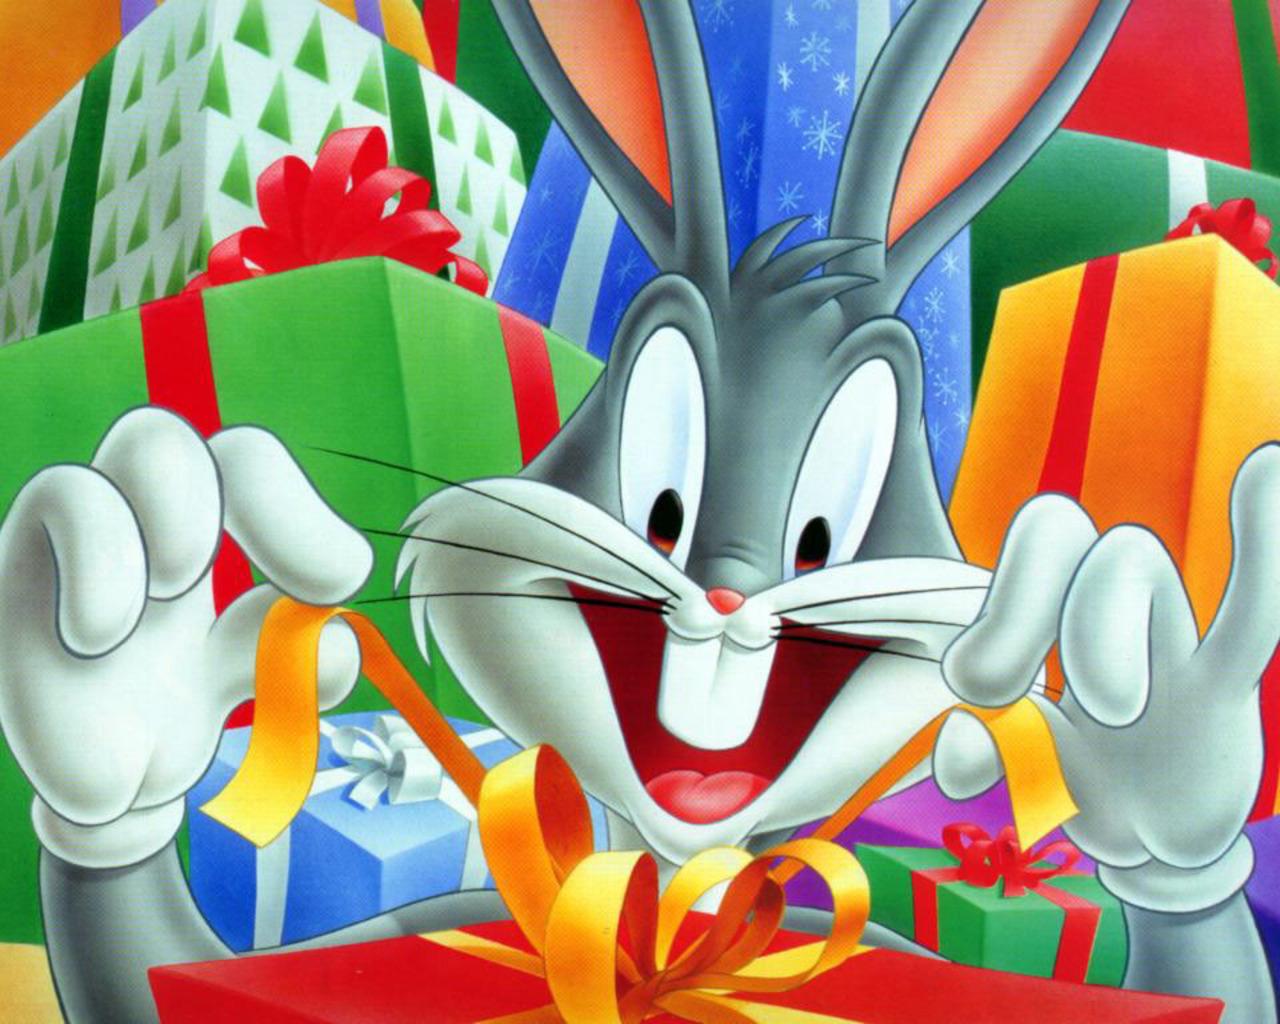 http://3.bp.blogspot.com/-Hn4B_fh2n2w/T6gWJJzrUII/AAAAAAAAGFg/yc2rSAIkLyA/s1600/Walt_disney_bugbunny_wallpaper_6.jpg